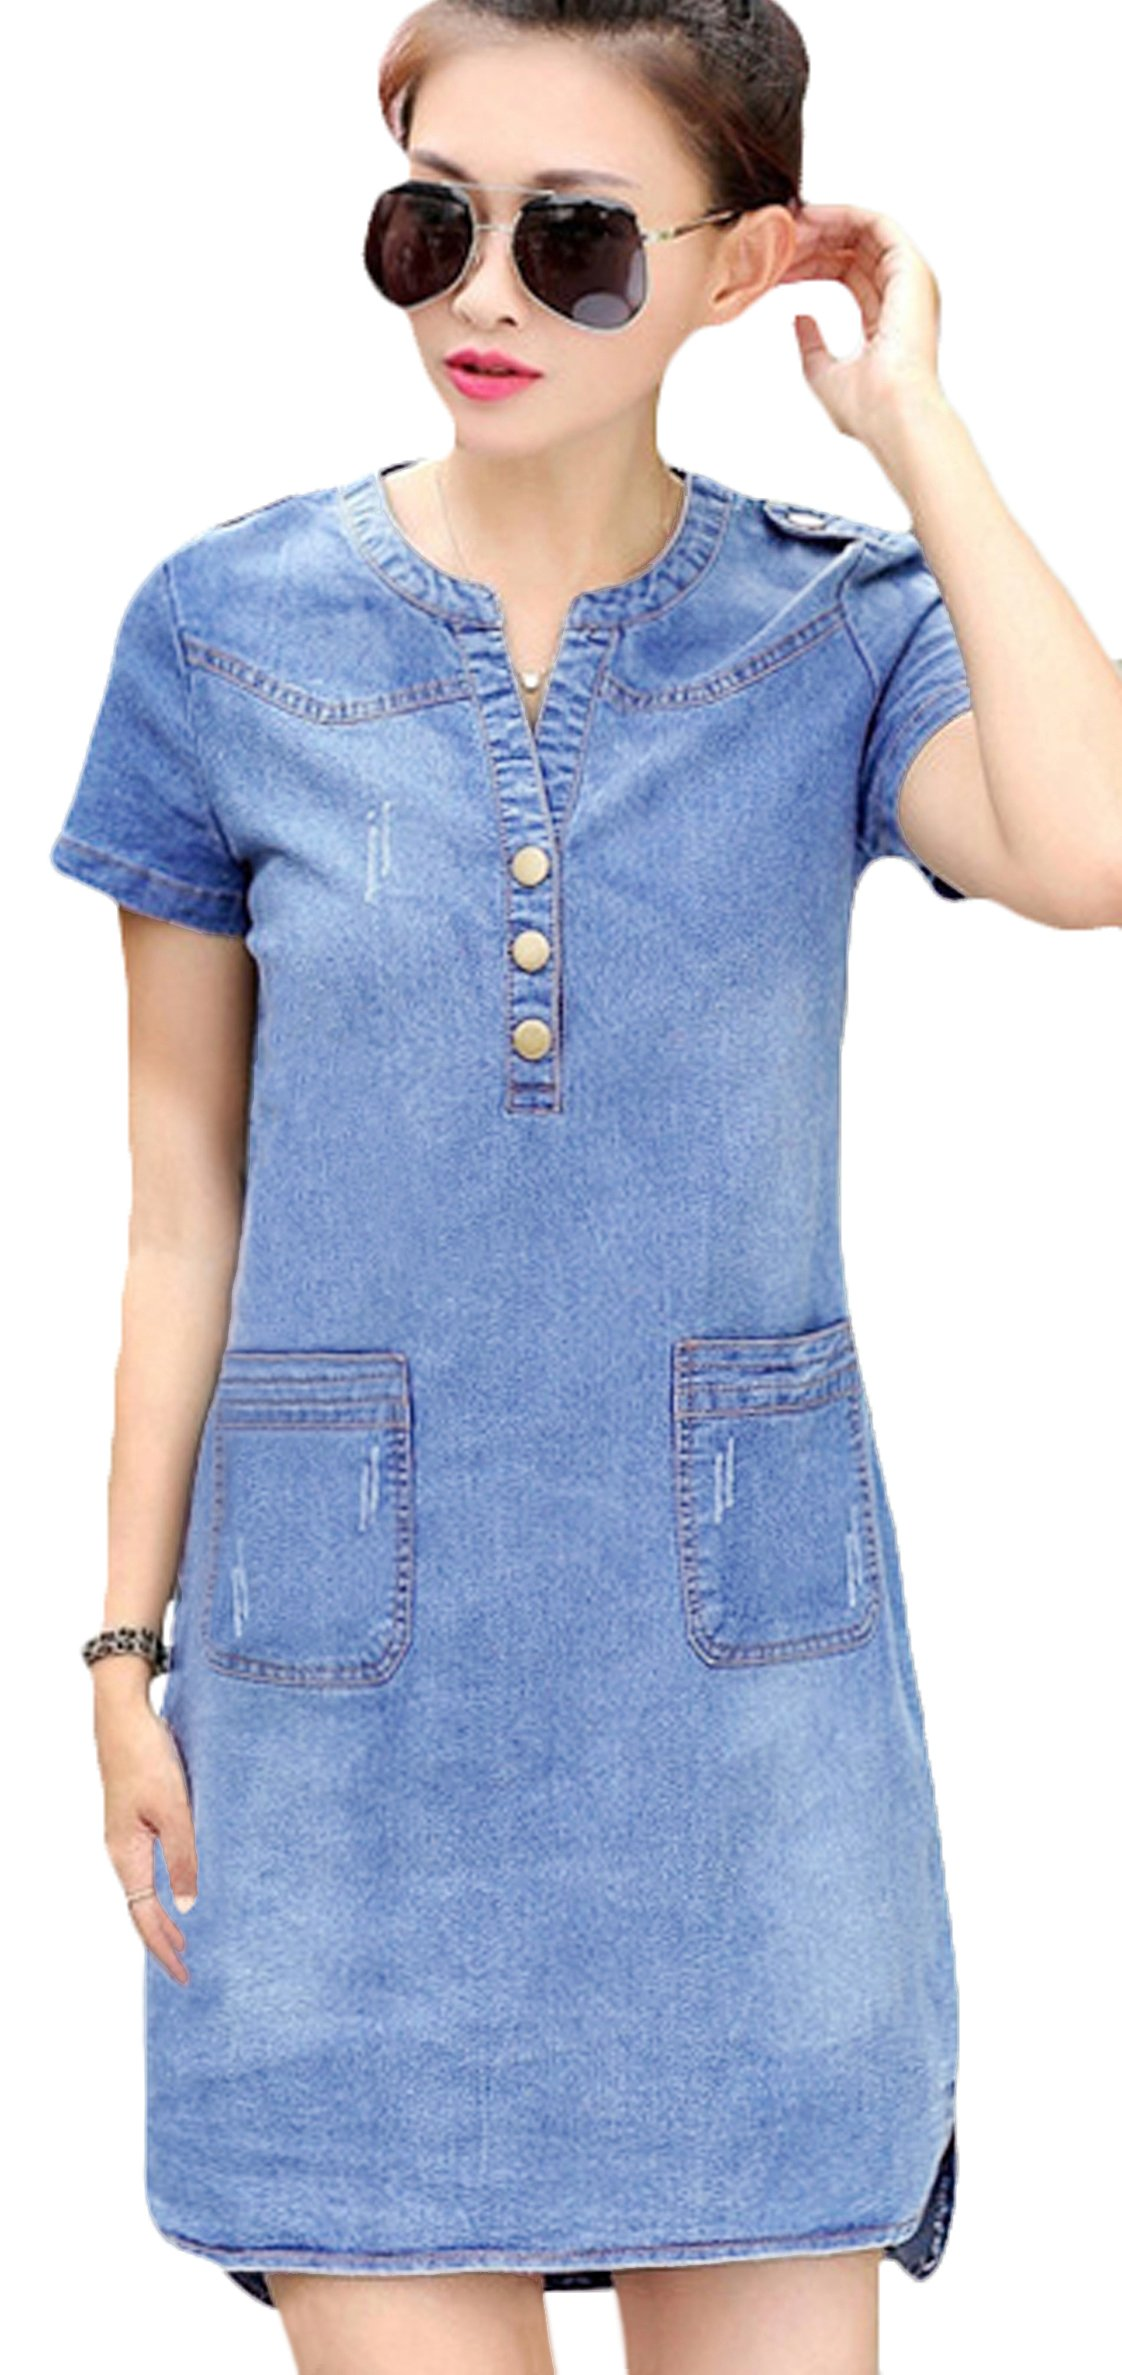 fd5245ebac Youhan Women s Vintage Fitted V-Neck Short Sleeve Denim Dress ...